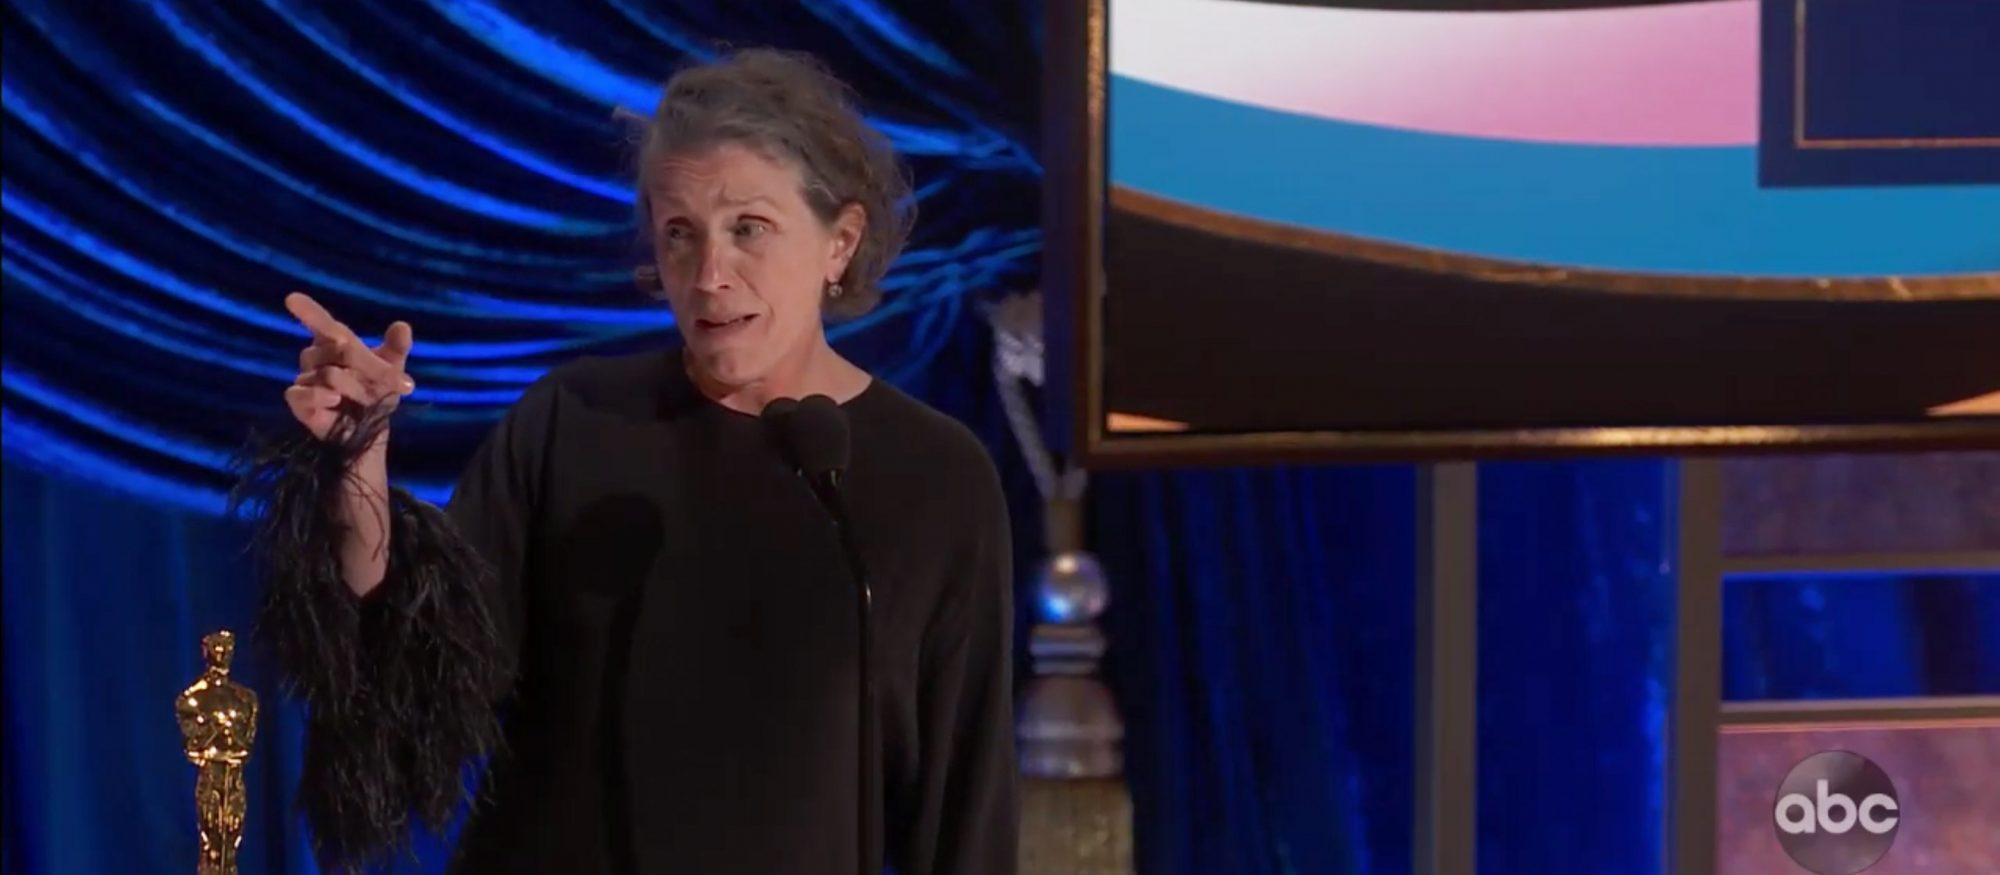 Frances McDormand wins Best Actress